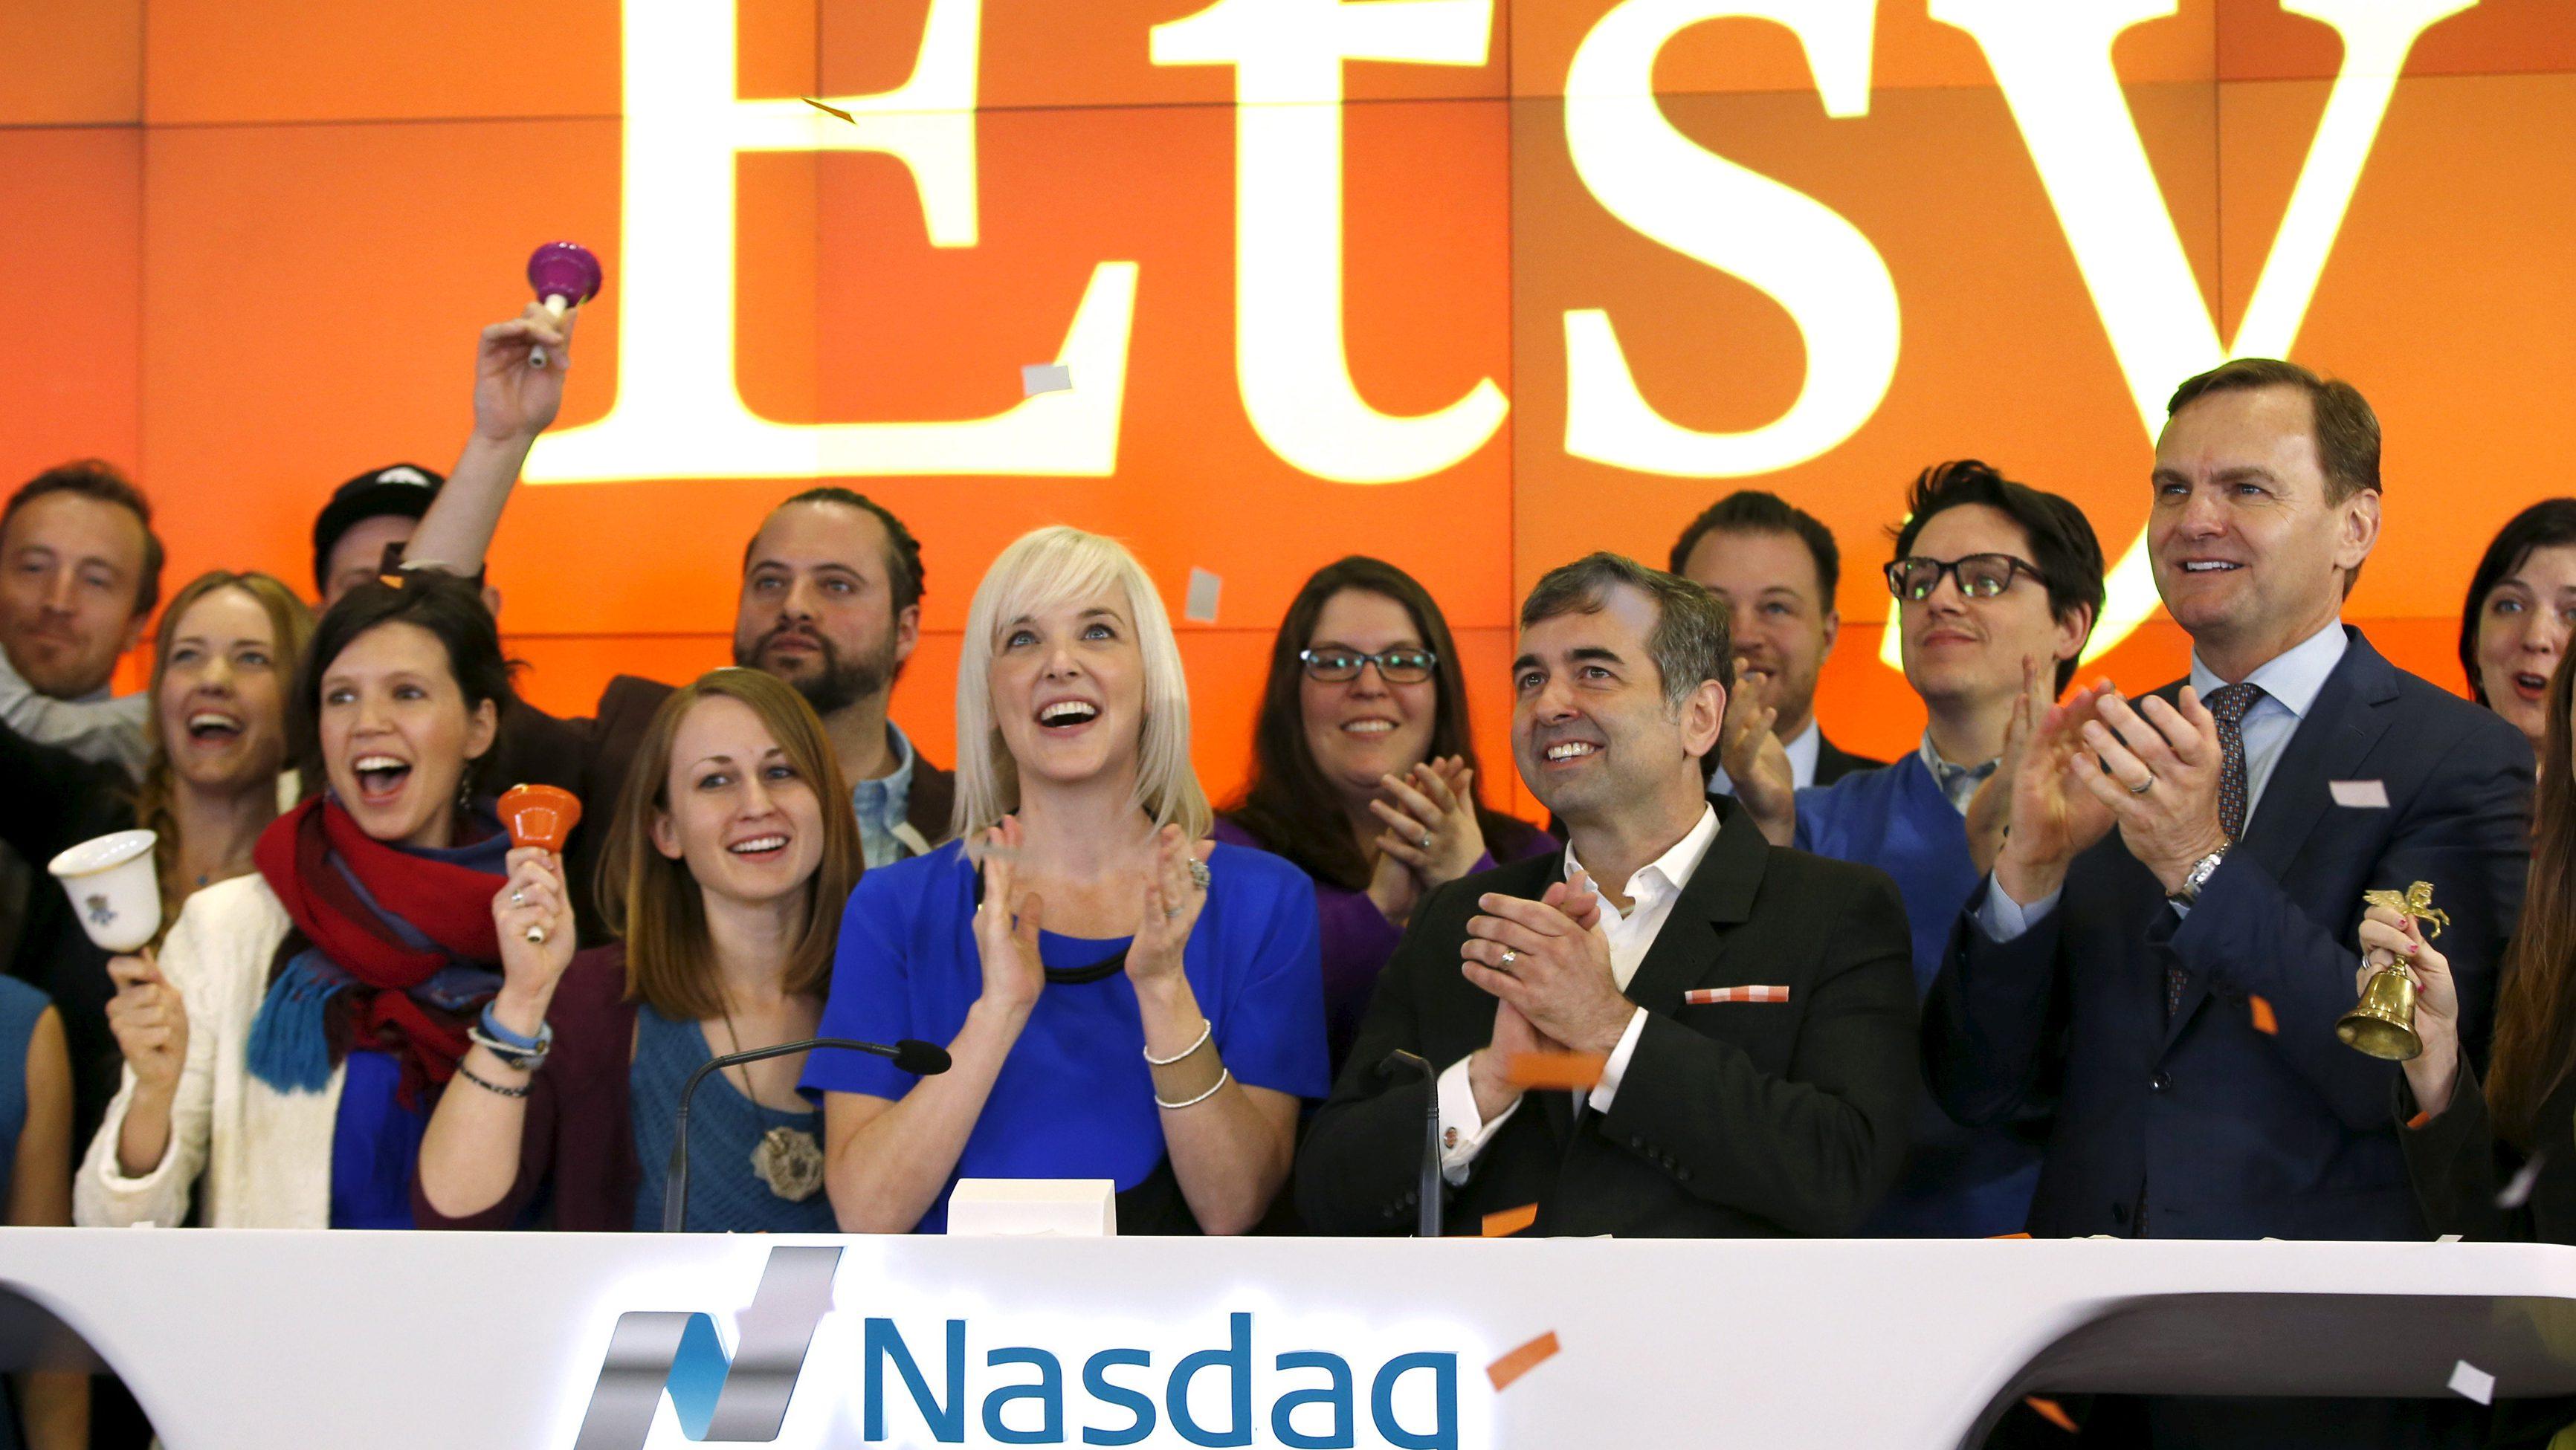 Etsy's generous employee perks left it vulnerable to activist inbdstors